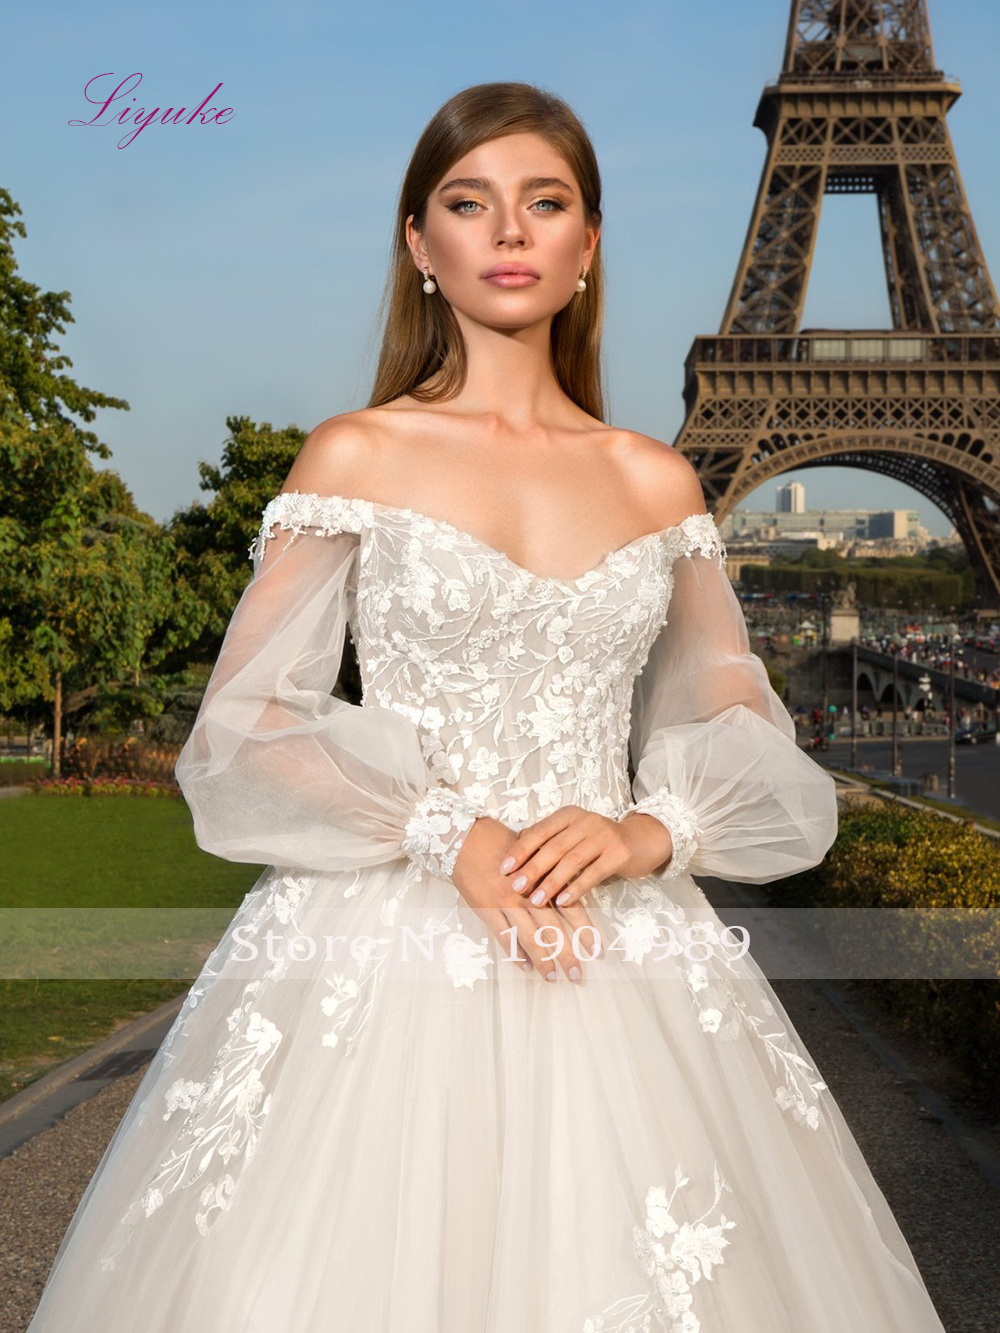 Liyuke 2019 Married Sweetheart Ball Gown Wedding Dress Long Lantern Sleeves Lace Appliques